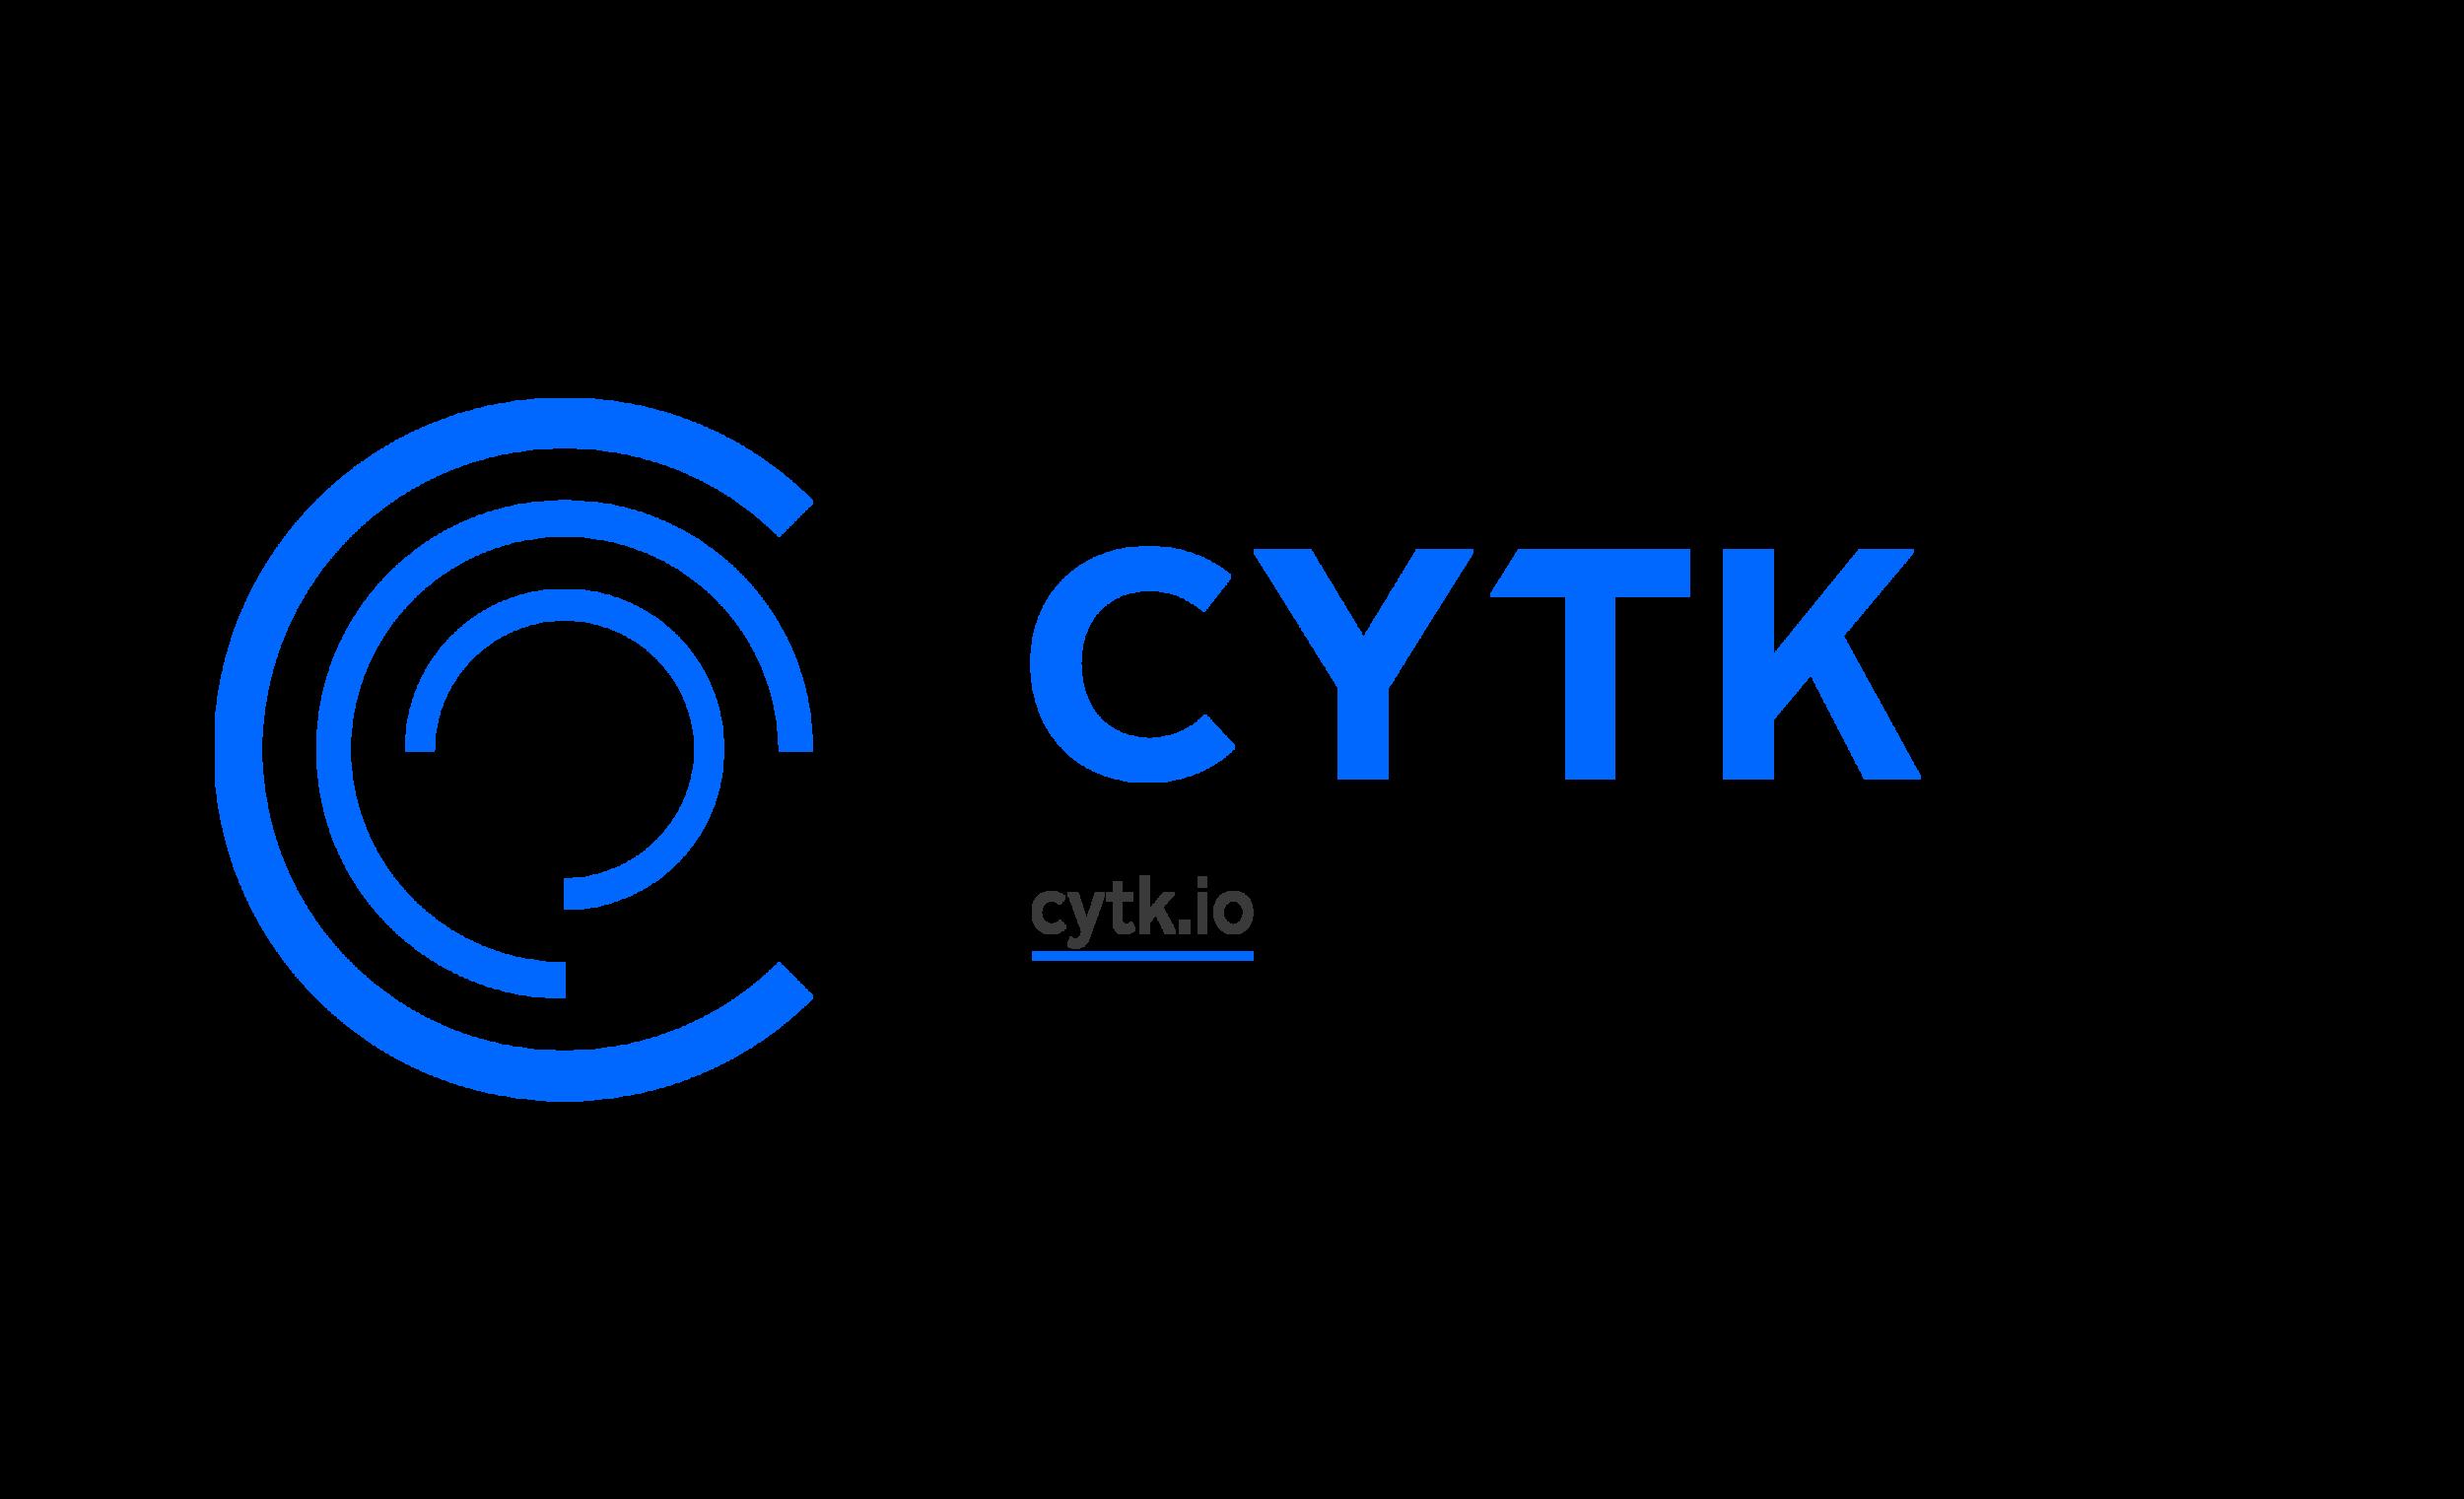 CYTK-Opt2-02B.png